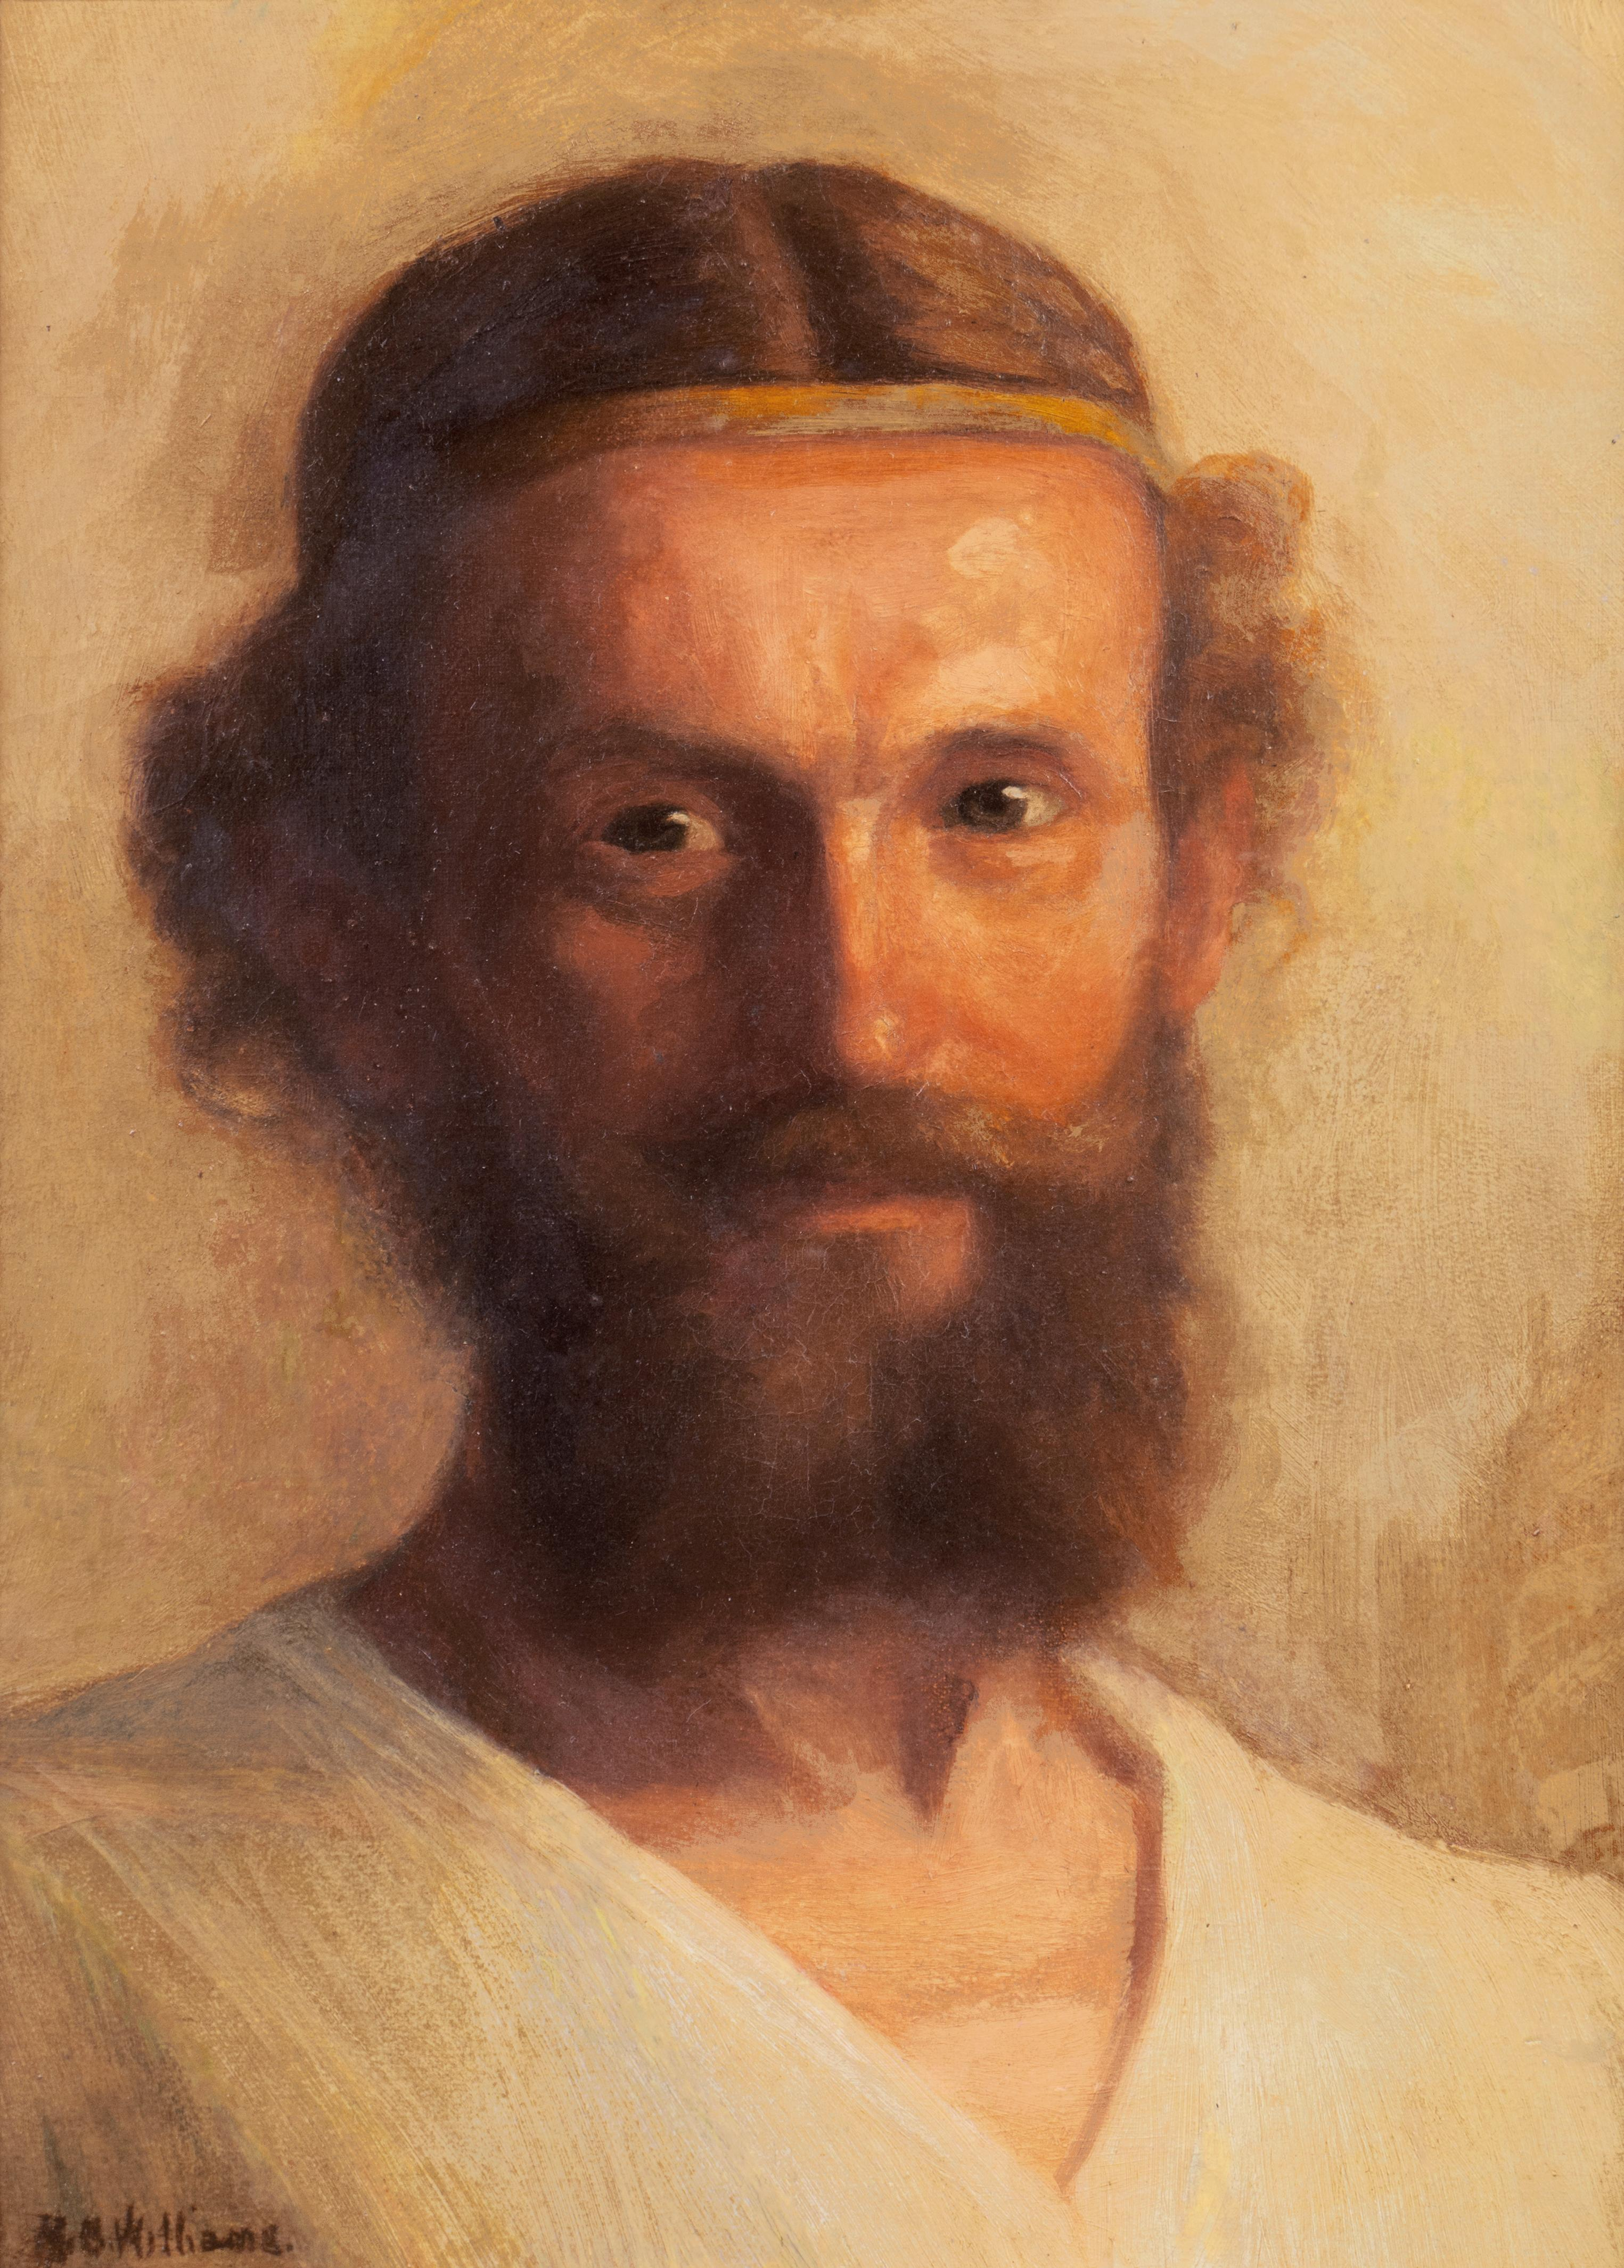 'Prophet', Chouinard Art Institute, Biblical, Old Testament, Early Christian